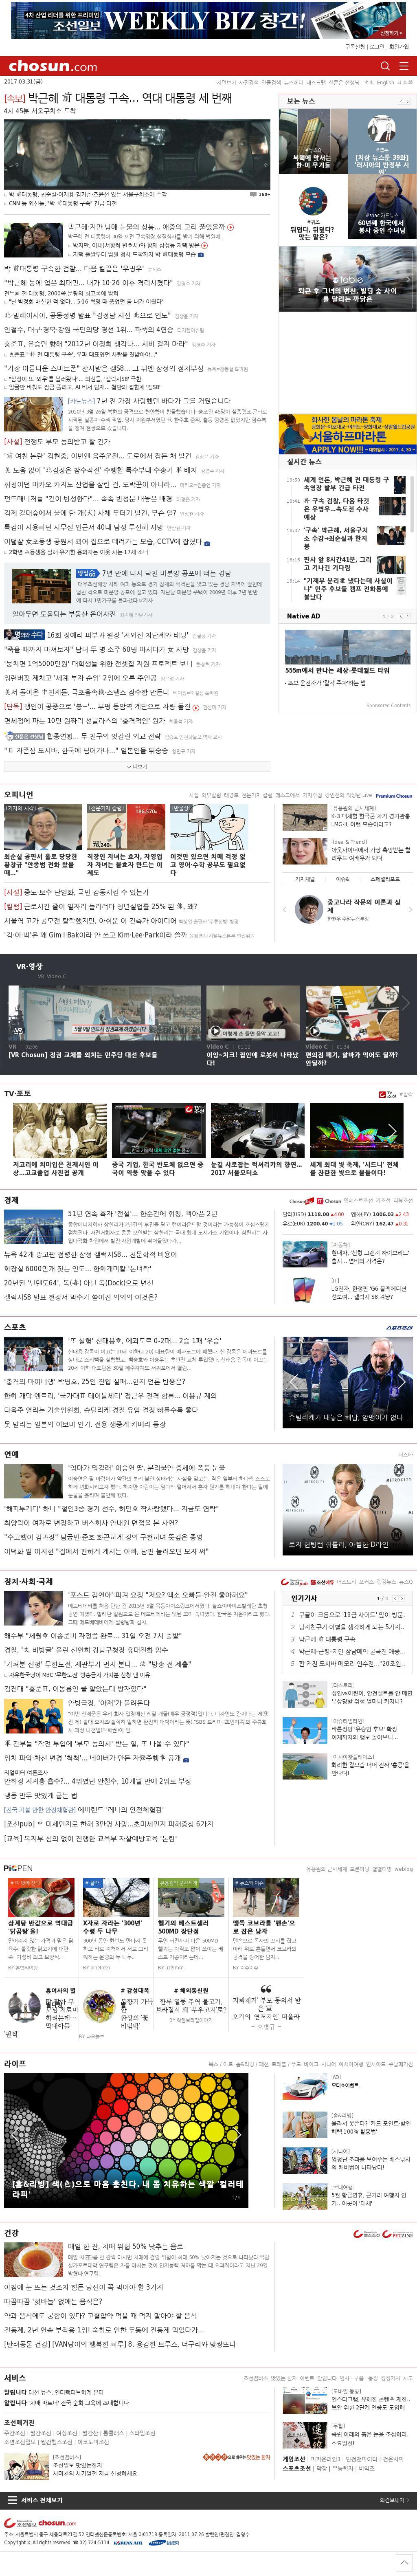 chosun.com at Thursday March 30, 2017, 8:02 p.m. UTC